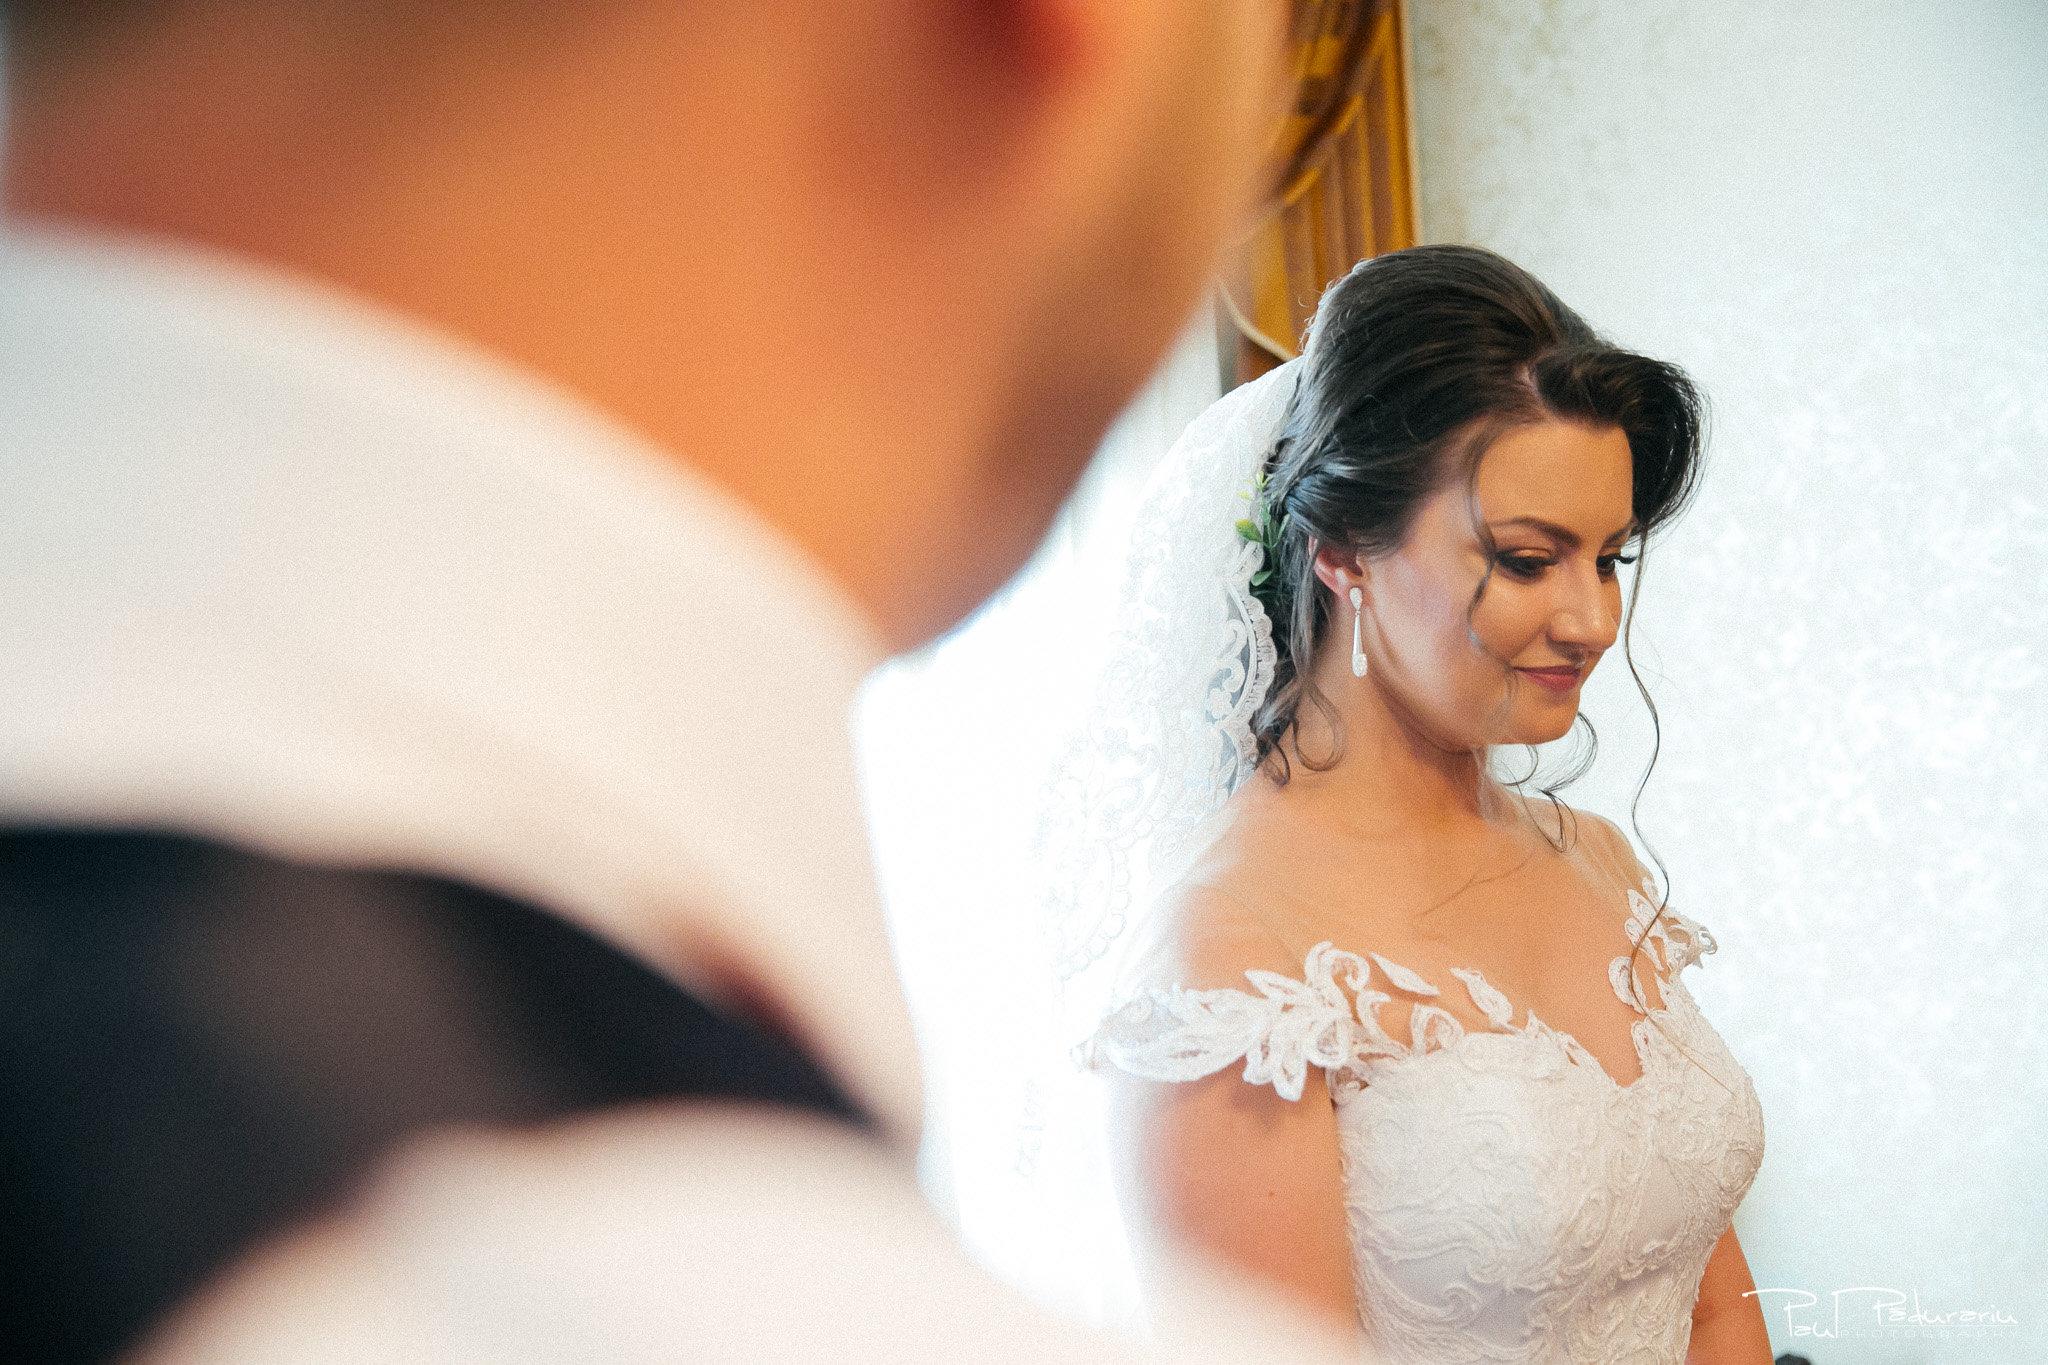 Pregatirea miresei Ariadna si Iulian fotografie nunta Iasi www.paulpadurariu.ro © 2017 Paul Padurariu